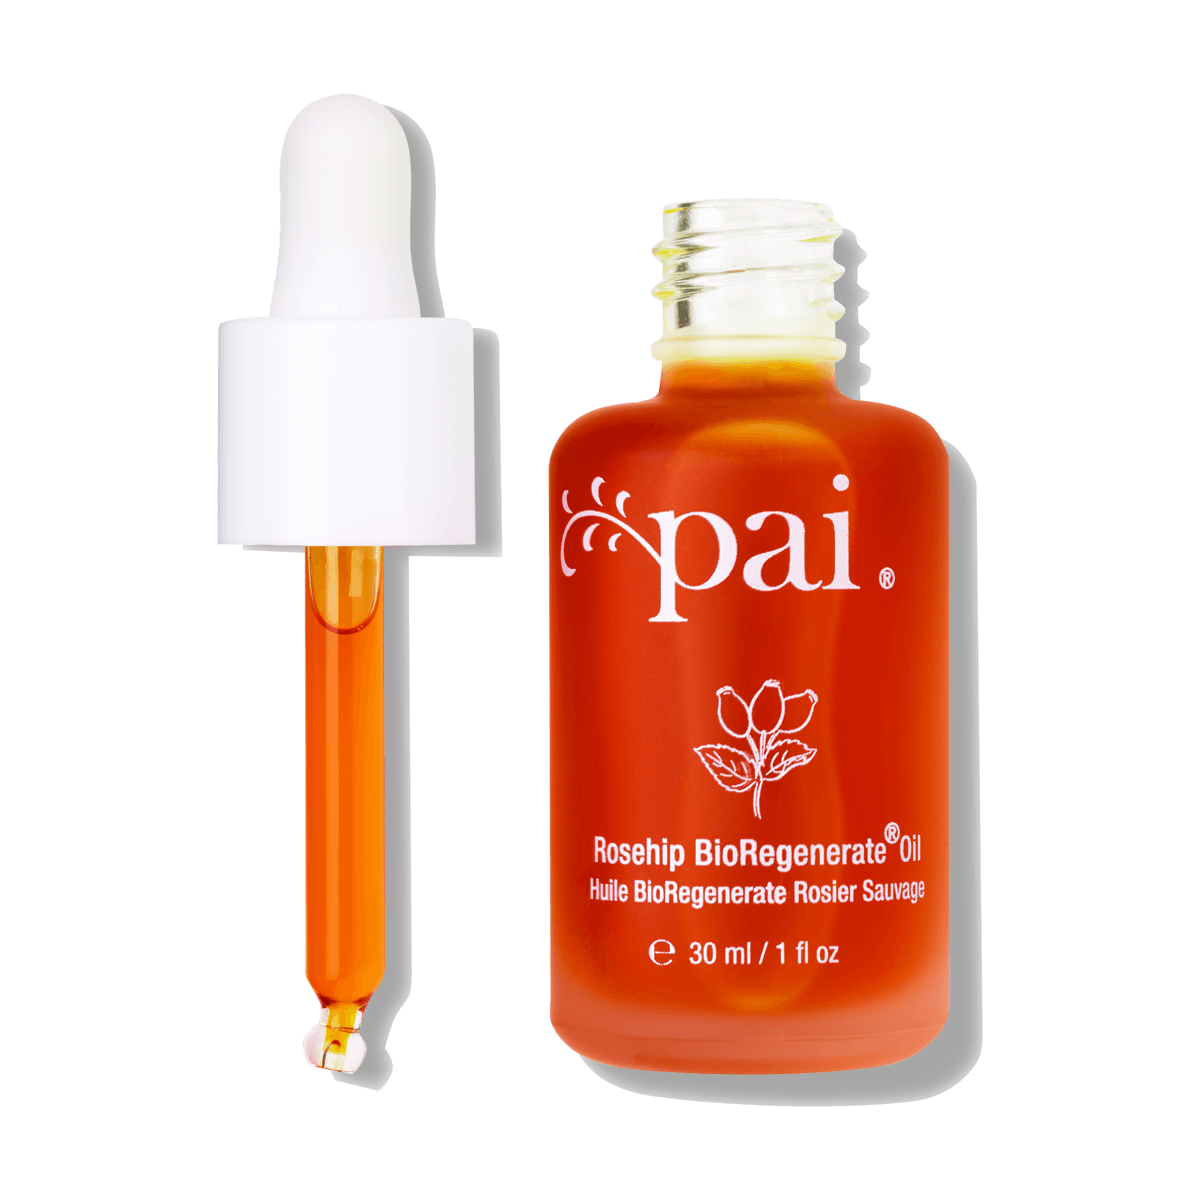 pai-Rosehip_regenerate-oil.png